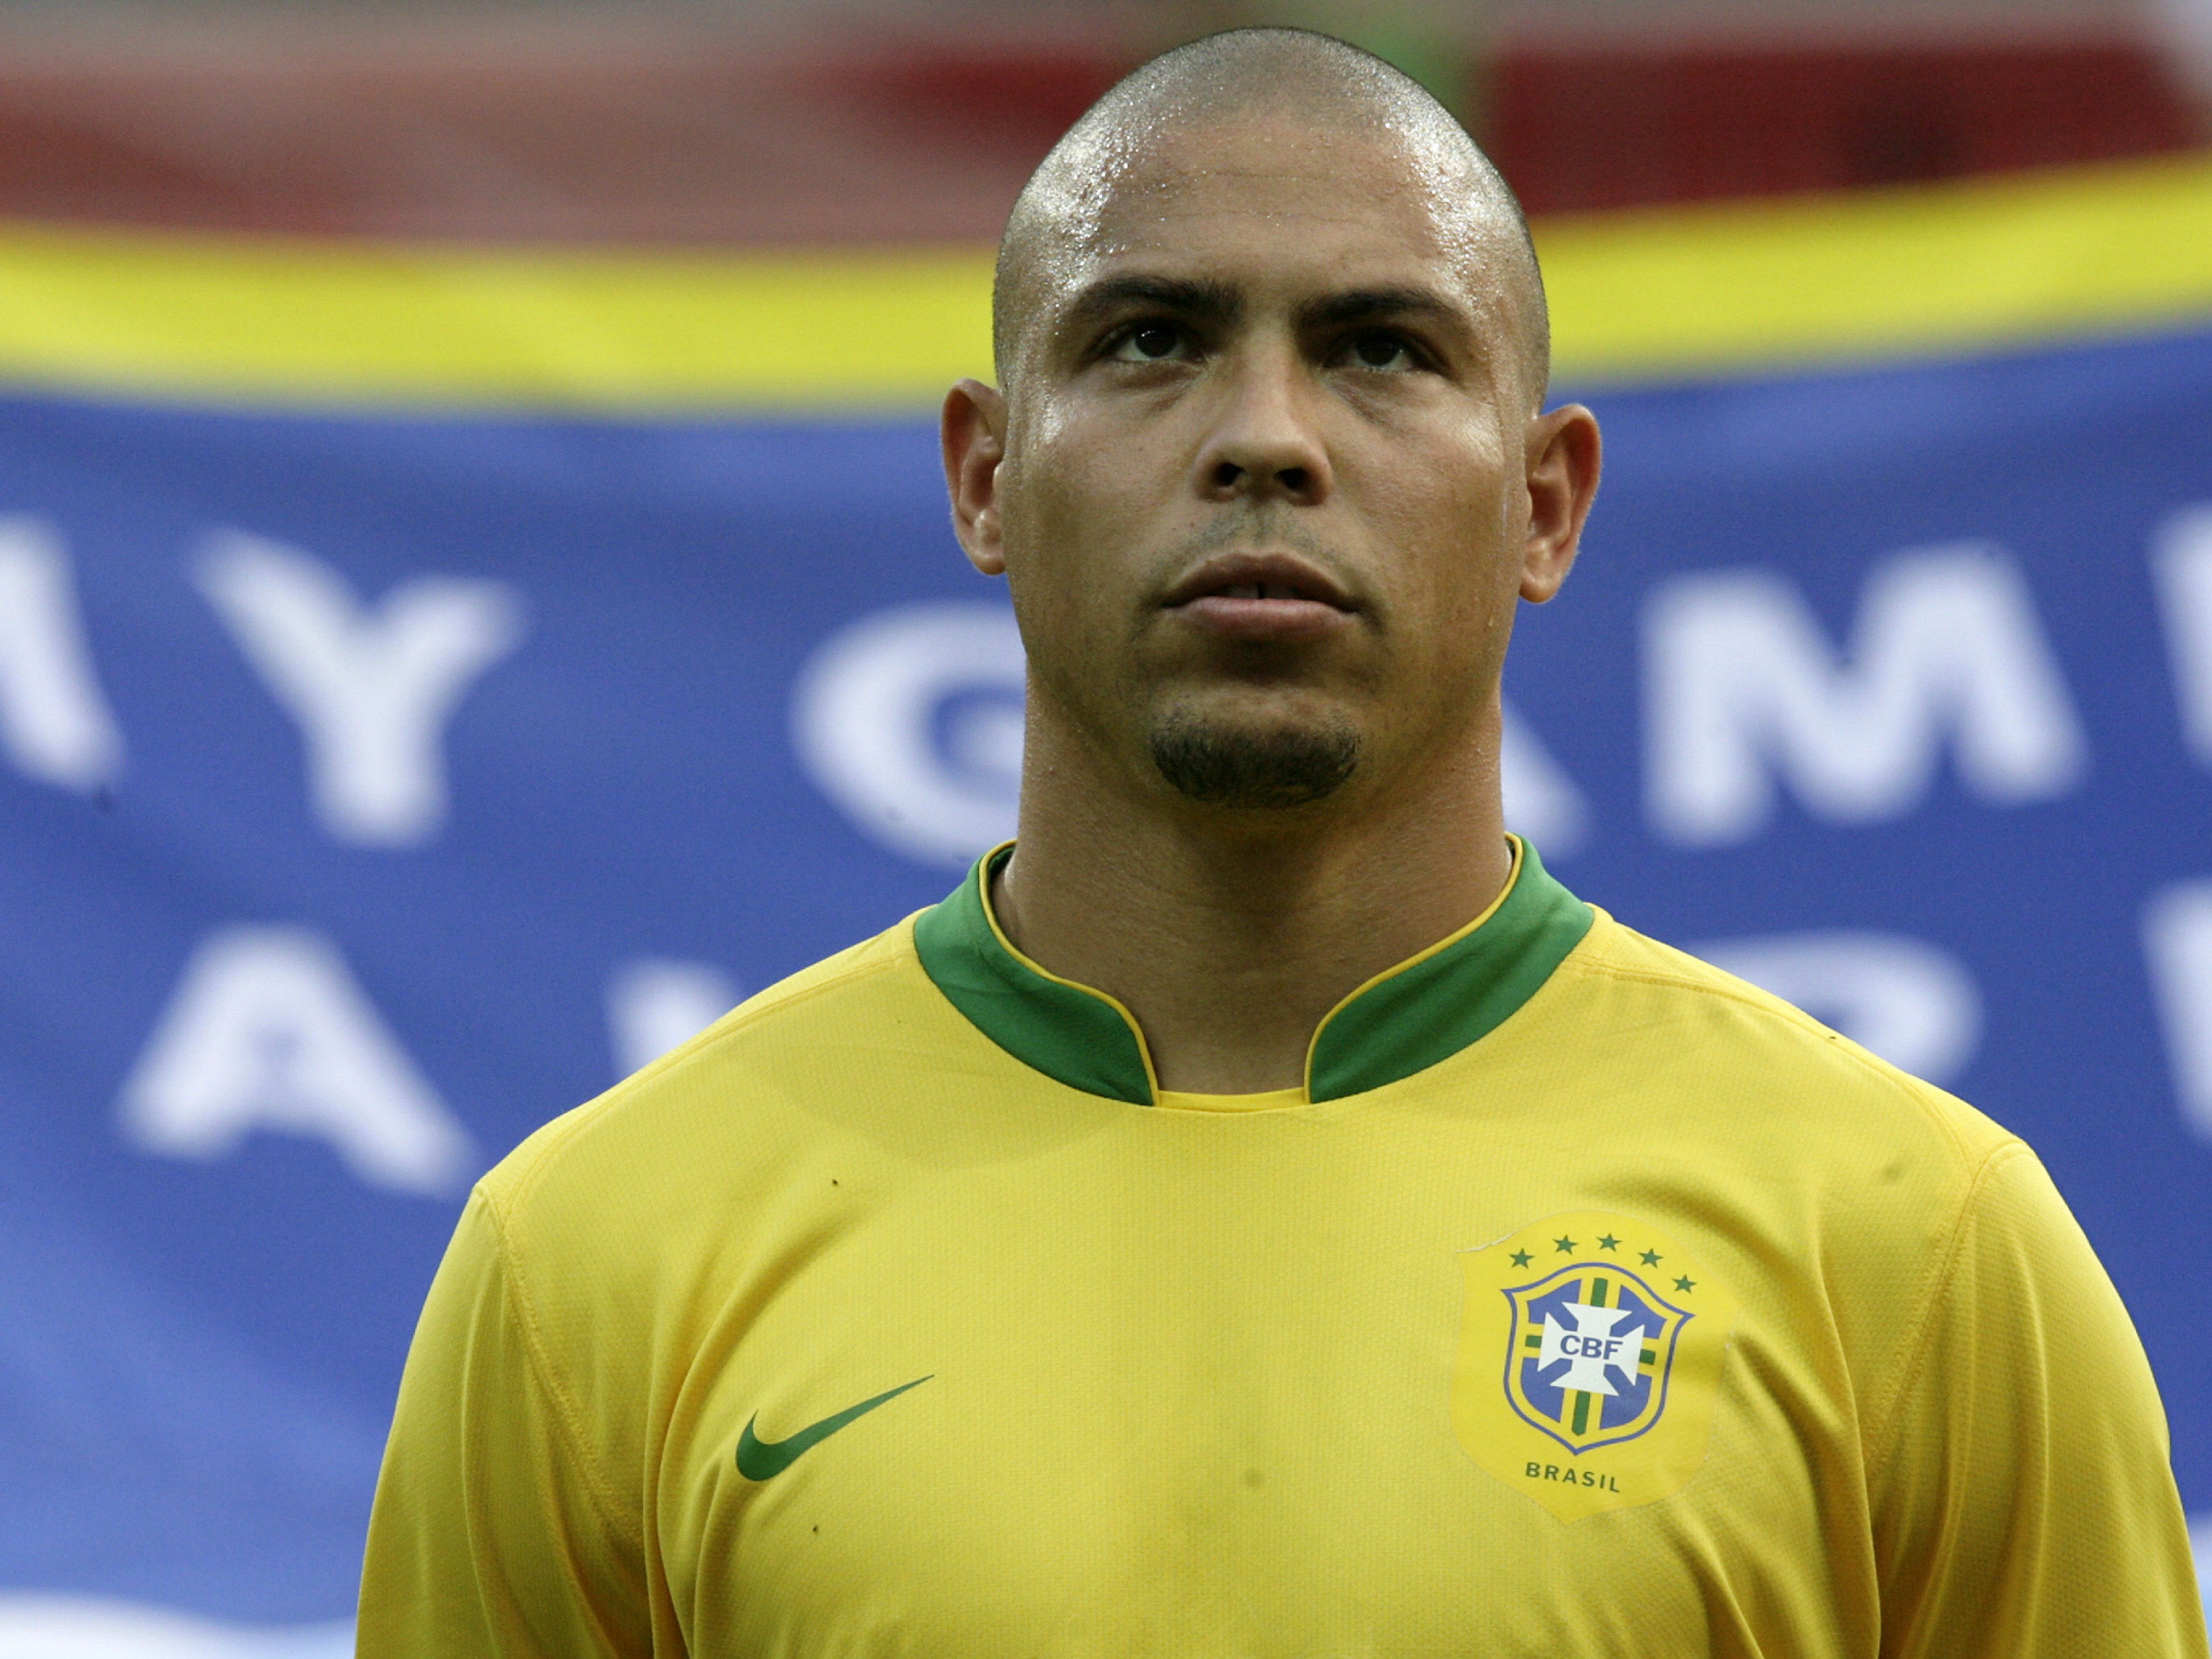 Brazilian-forward-Ronaldo-listens-to-the-1560171574.jpg